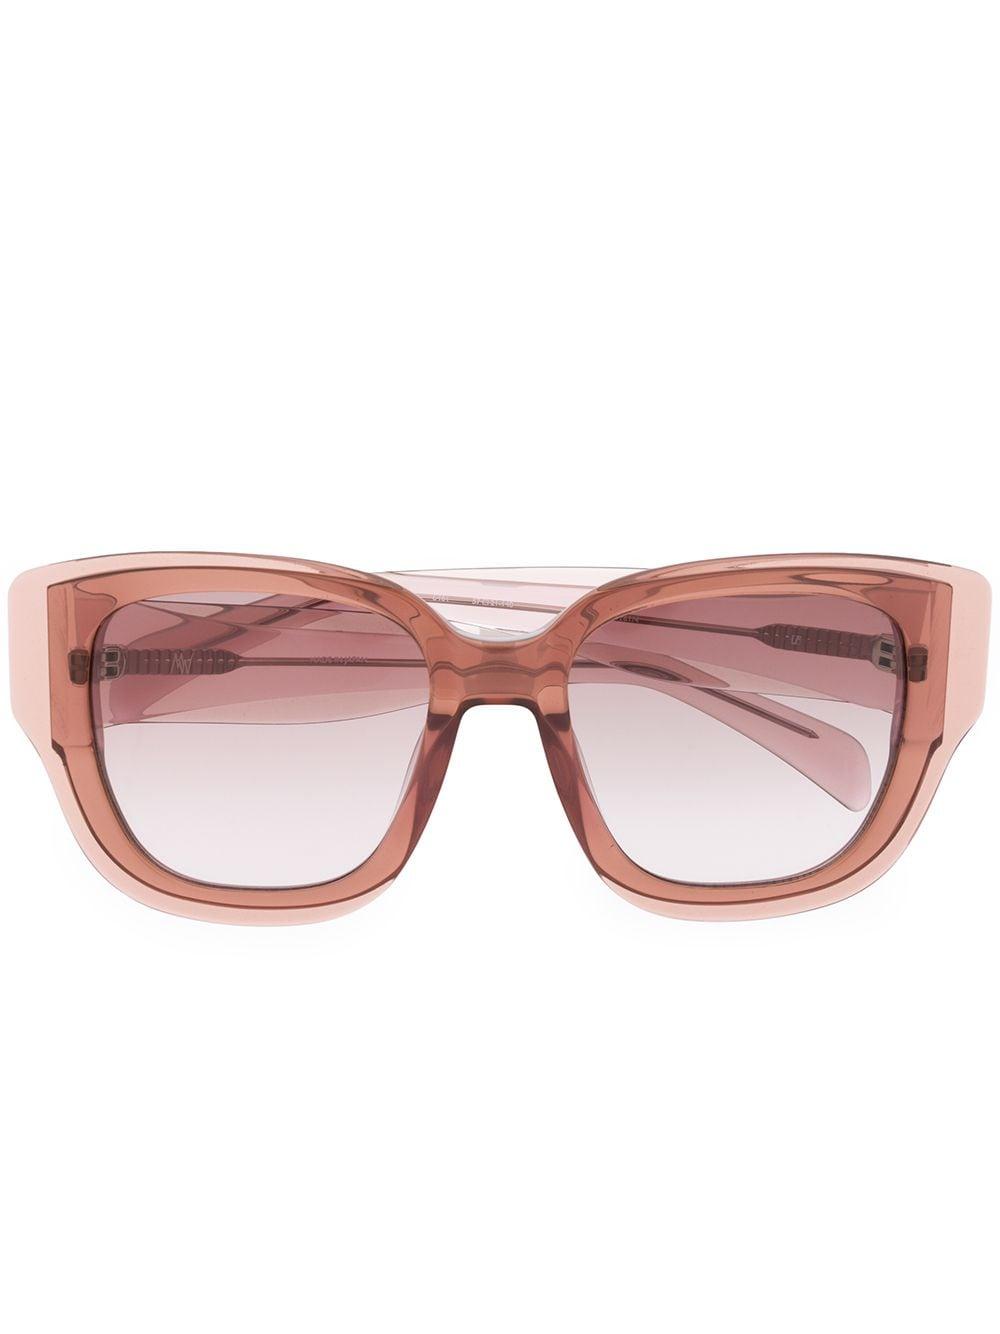 Linda Farrow 'Senna' Oversized-Sonnenbrille - Lila